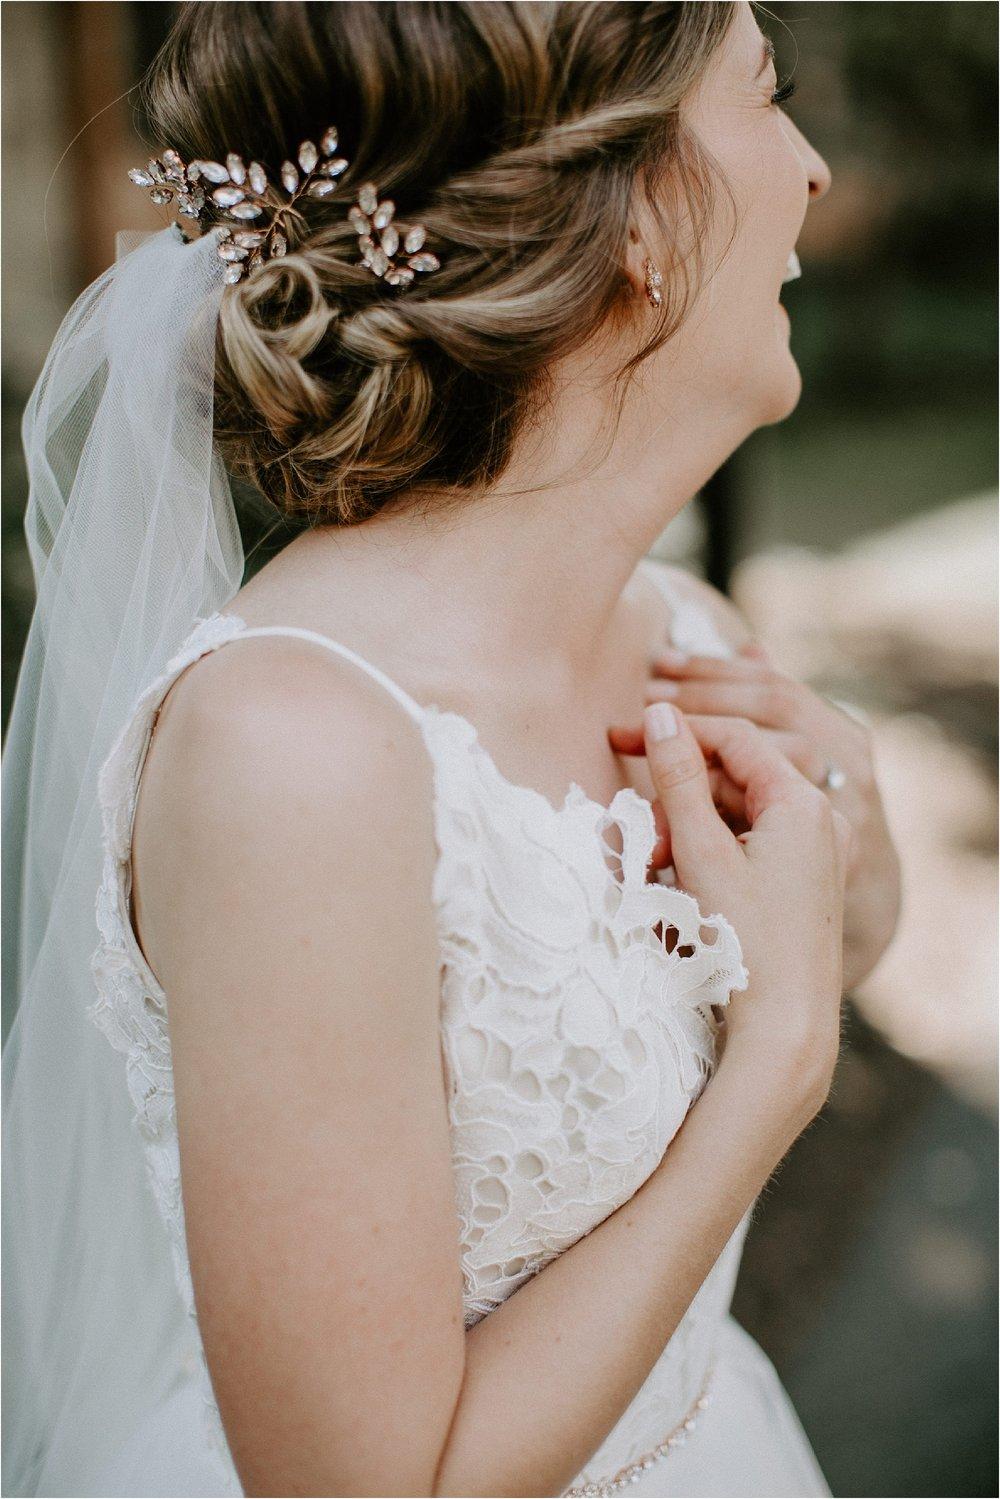 Sarah_Brookhart_Lancaster_Wedding_Photographer_0017.jpg